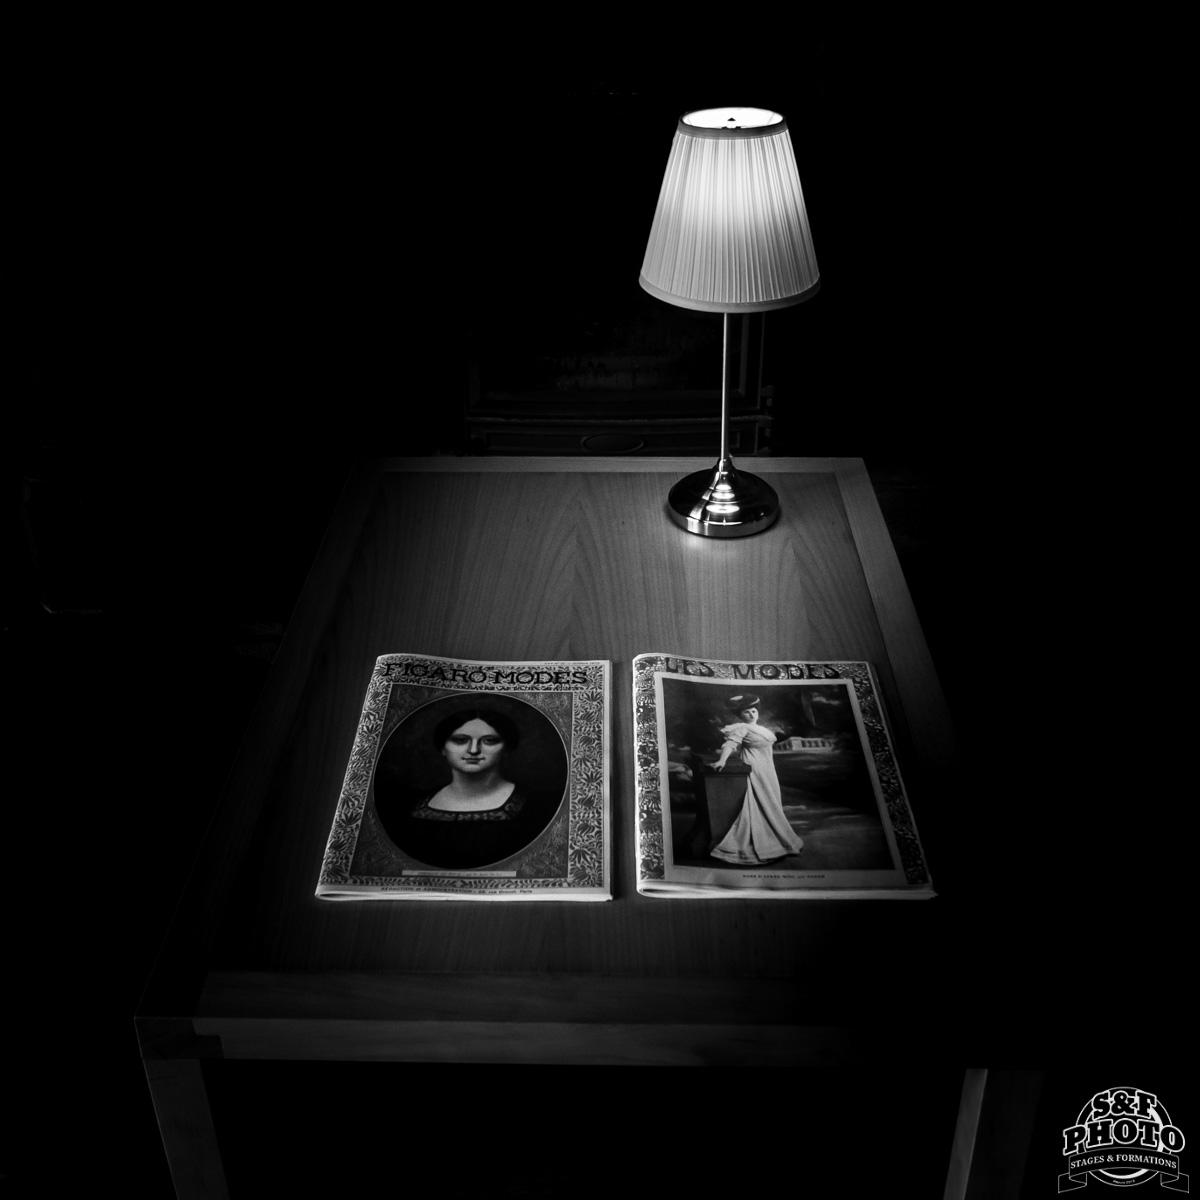 apprendre la photo en noir et blanc en bretagne